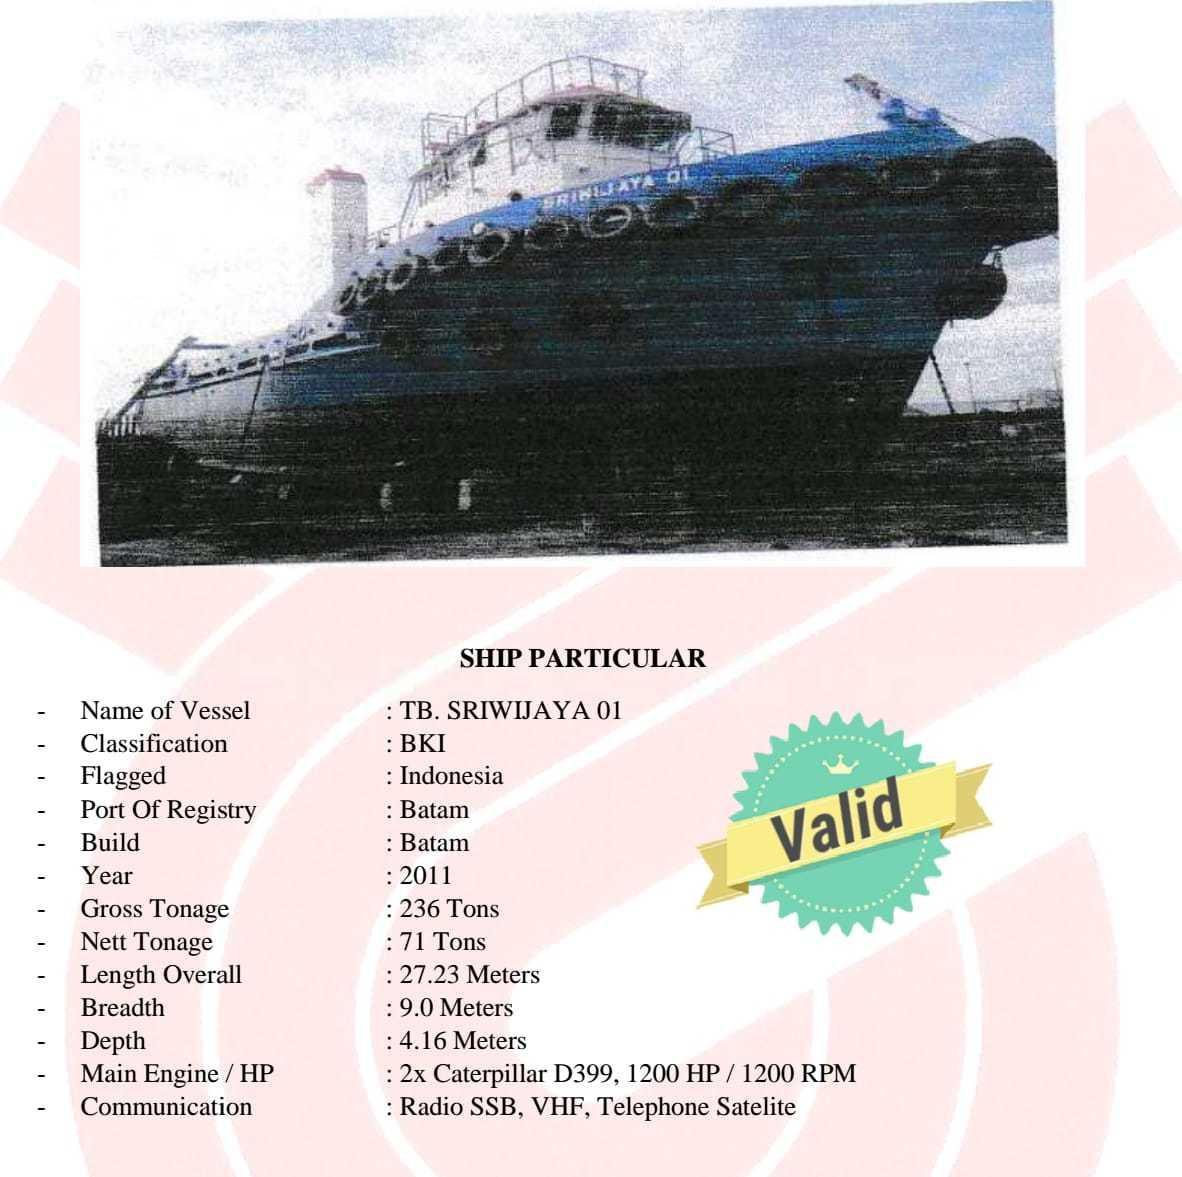 Tuggboat dan barge 2012 300 feet 2011 0000000444444